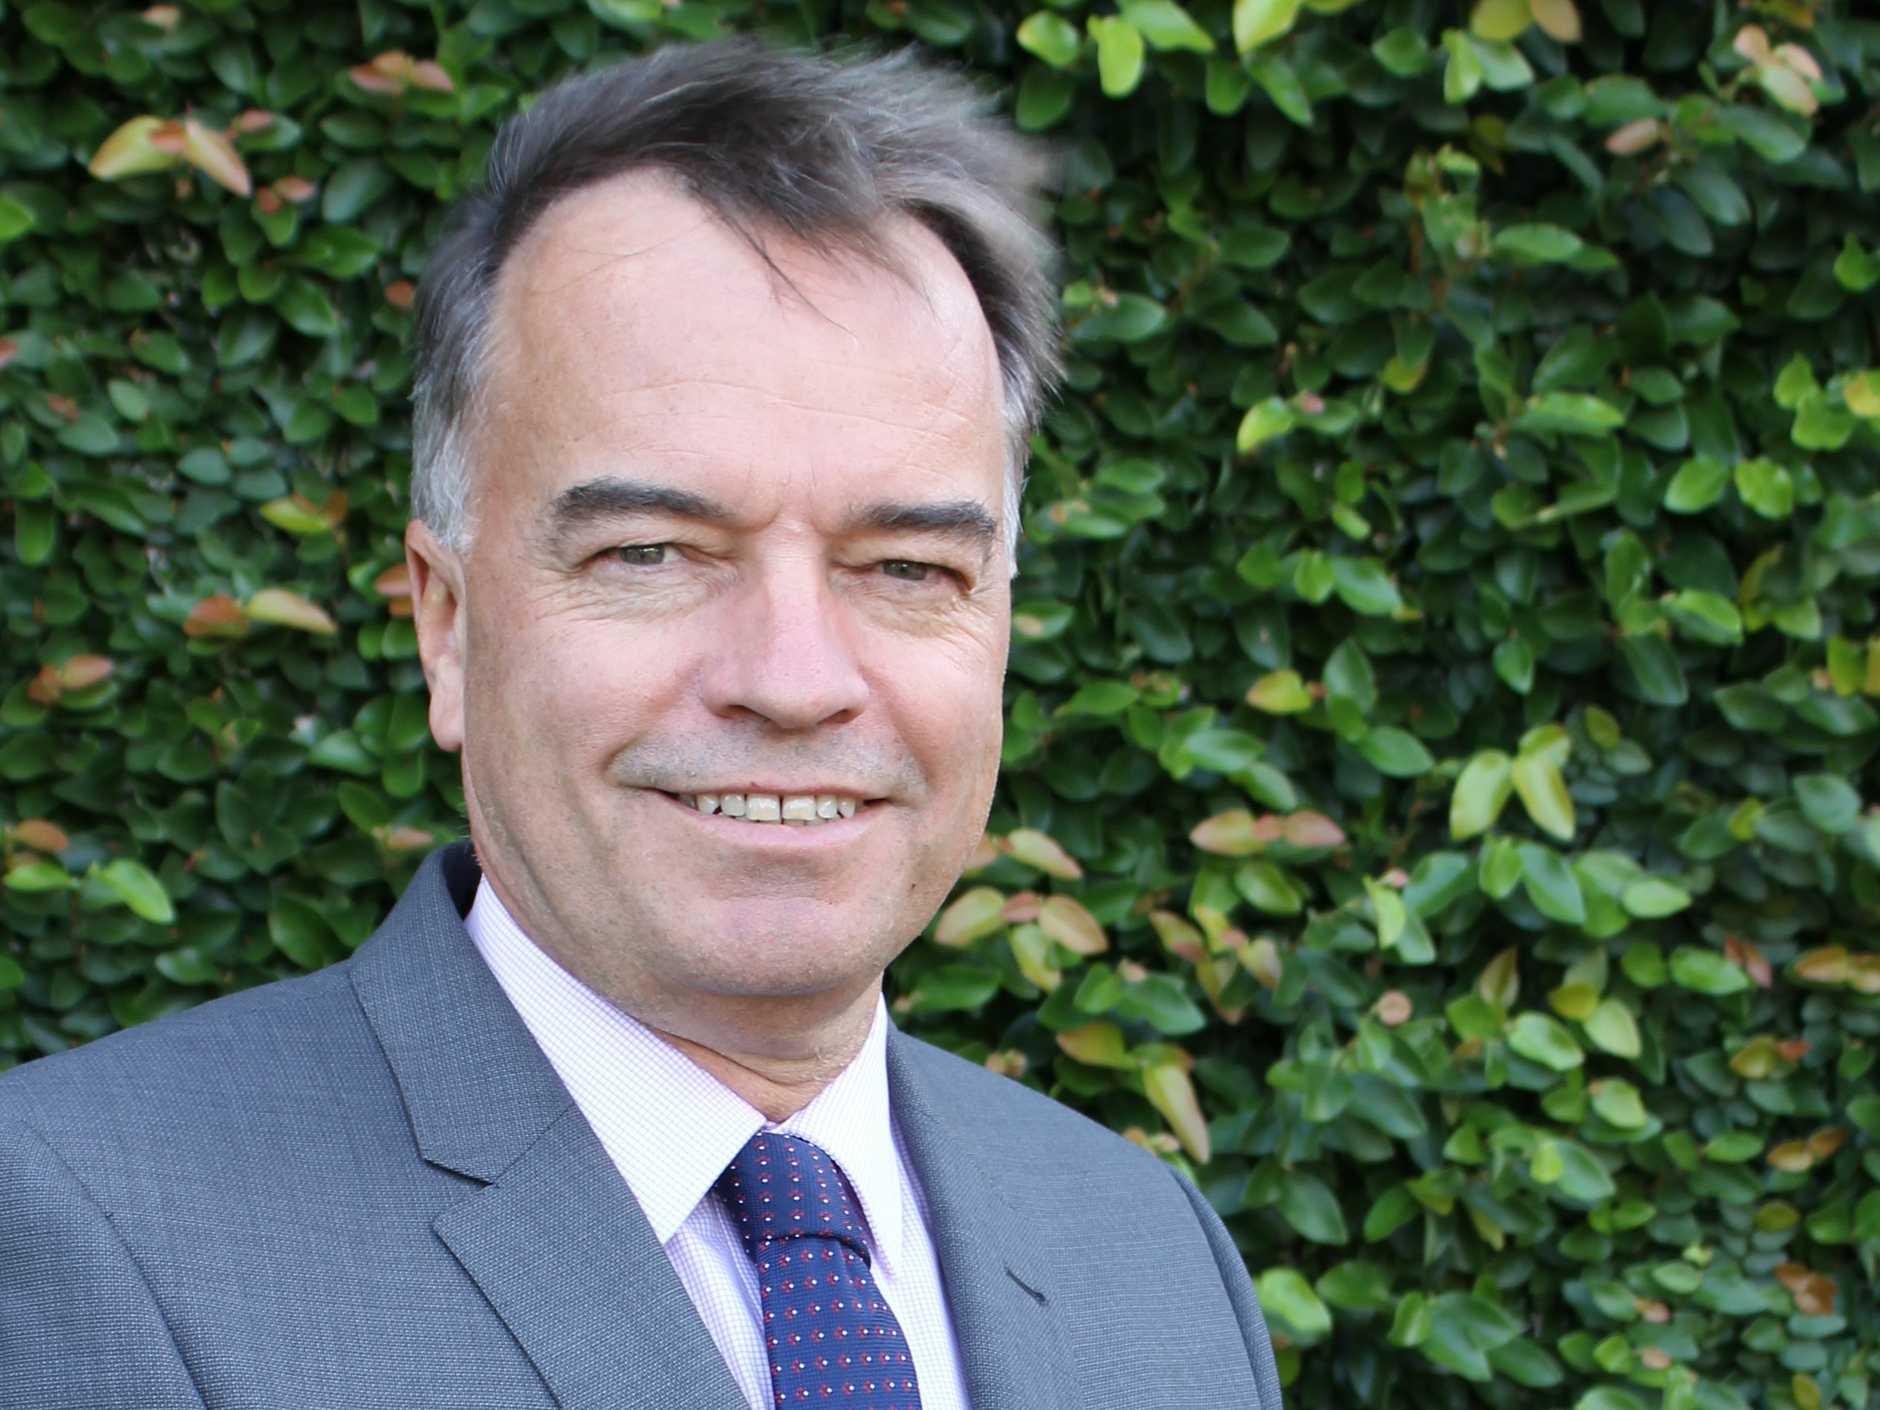 Toowoomba Chamber of Commerce board member Carl Rallings talks 457 visas.